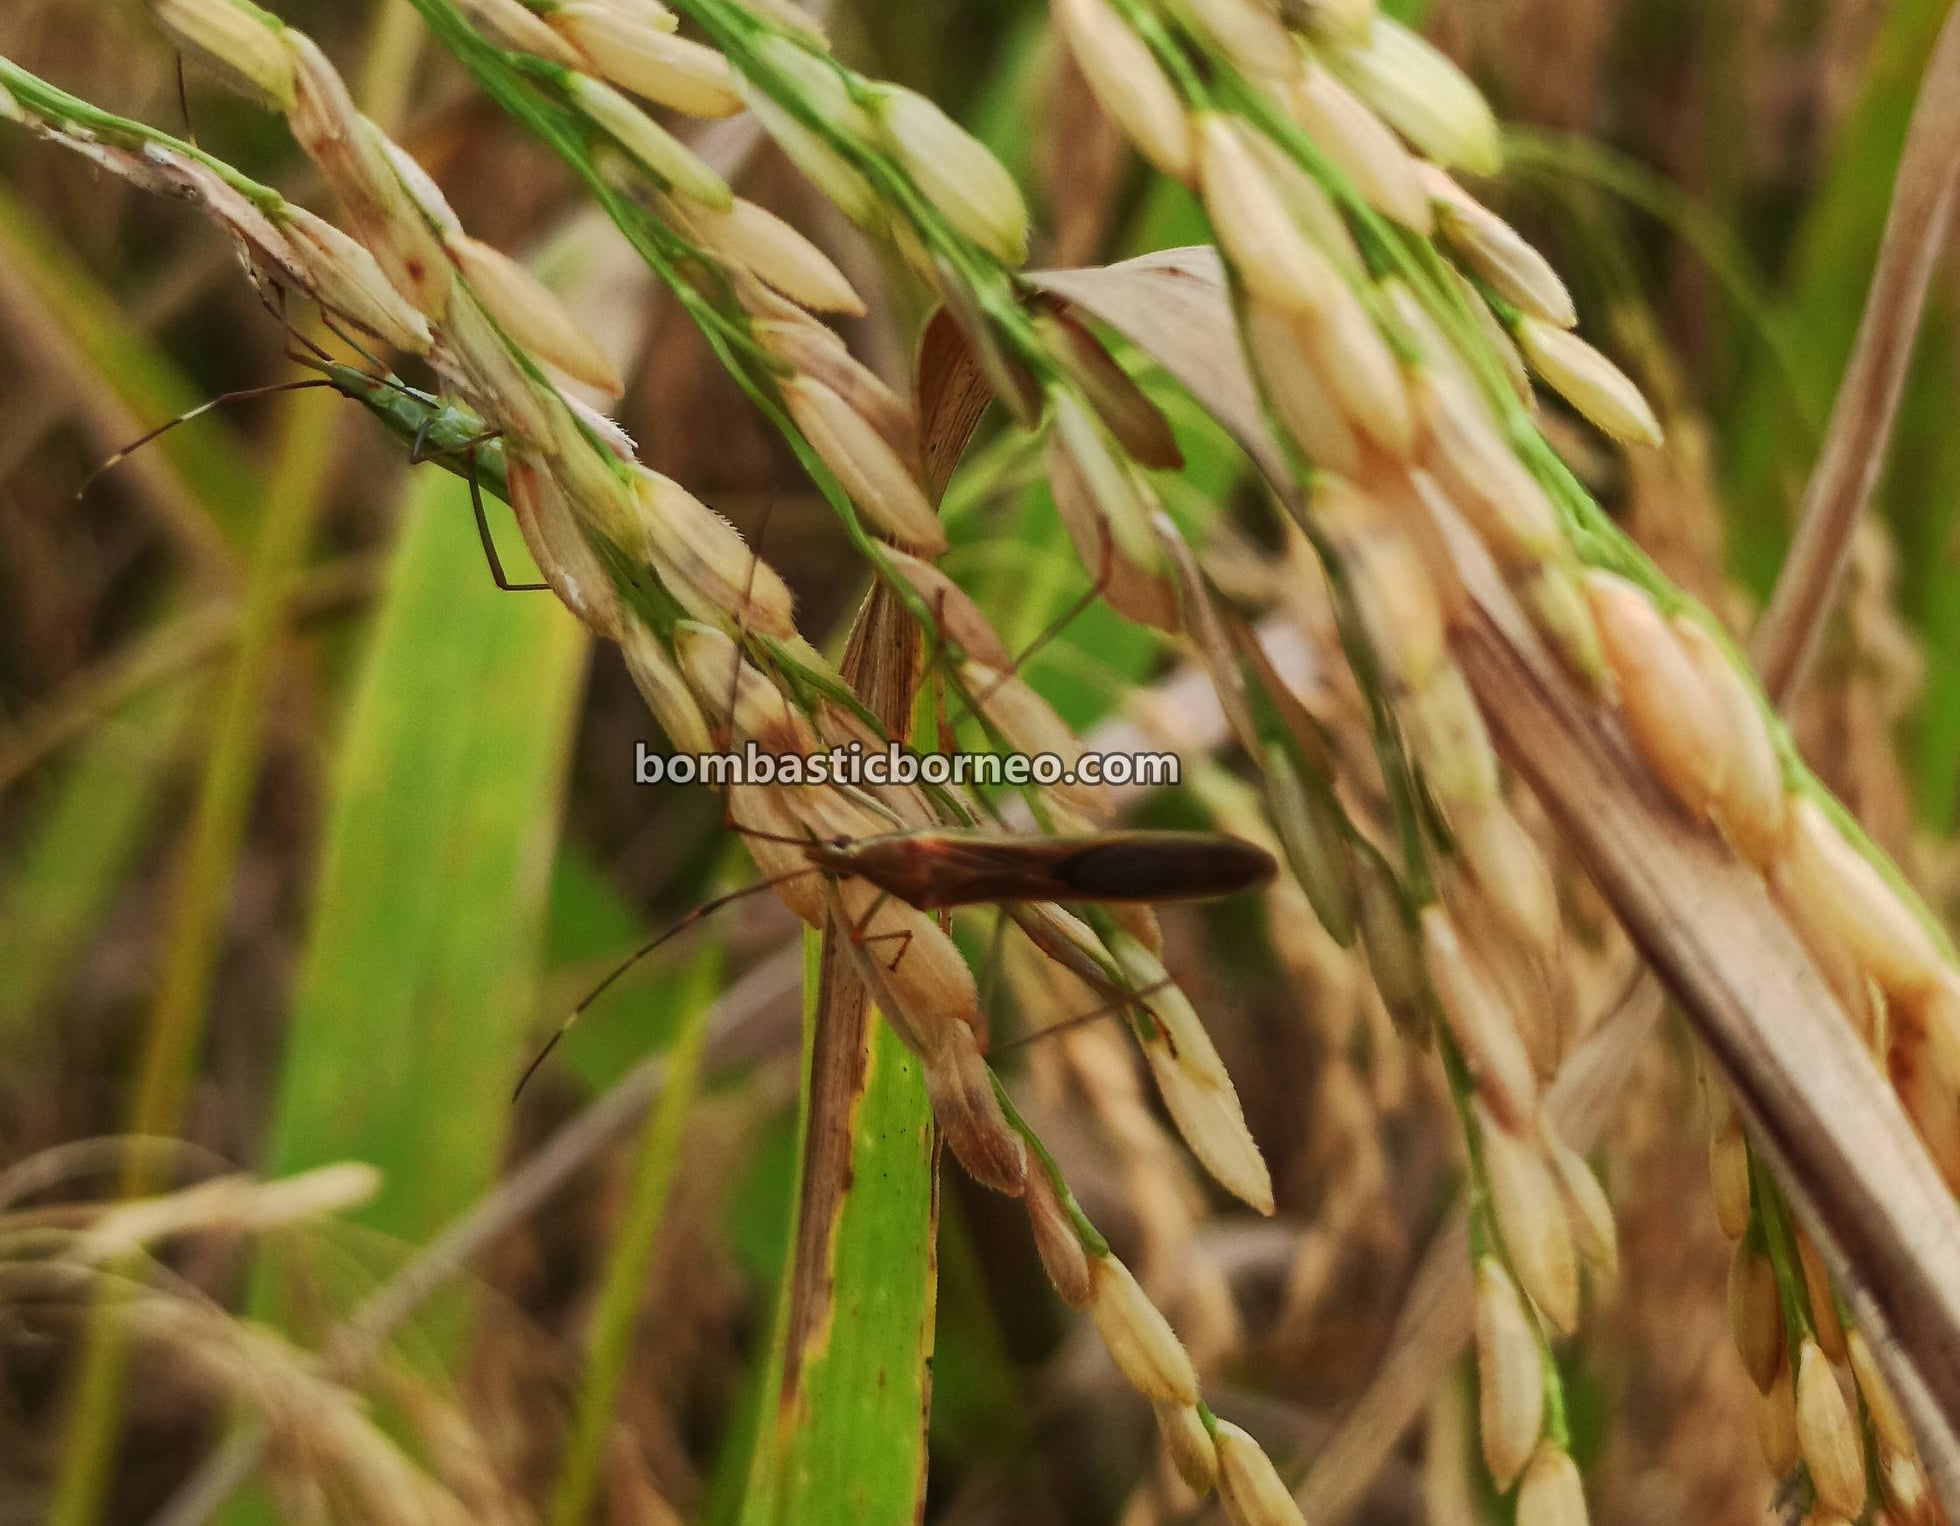 Paddy field, Paddy harvesting, Sawah Padi, exploration, Serian, Malaysia, perosak padi, travel guide, Borneo, 稻米害虫